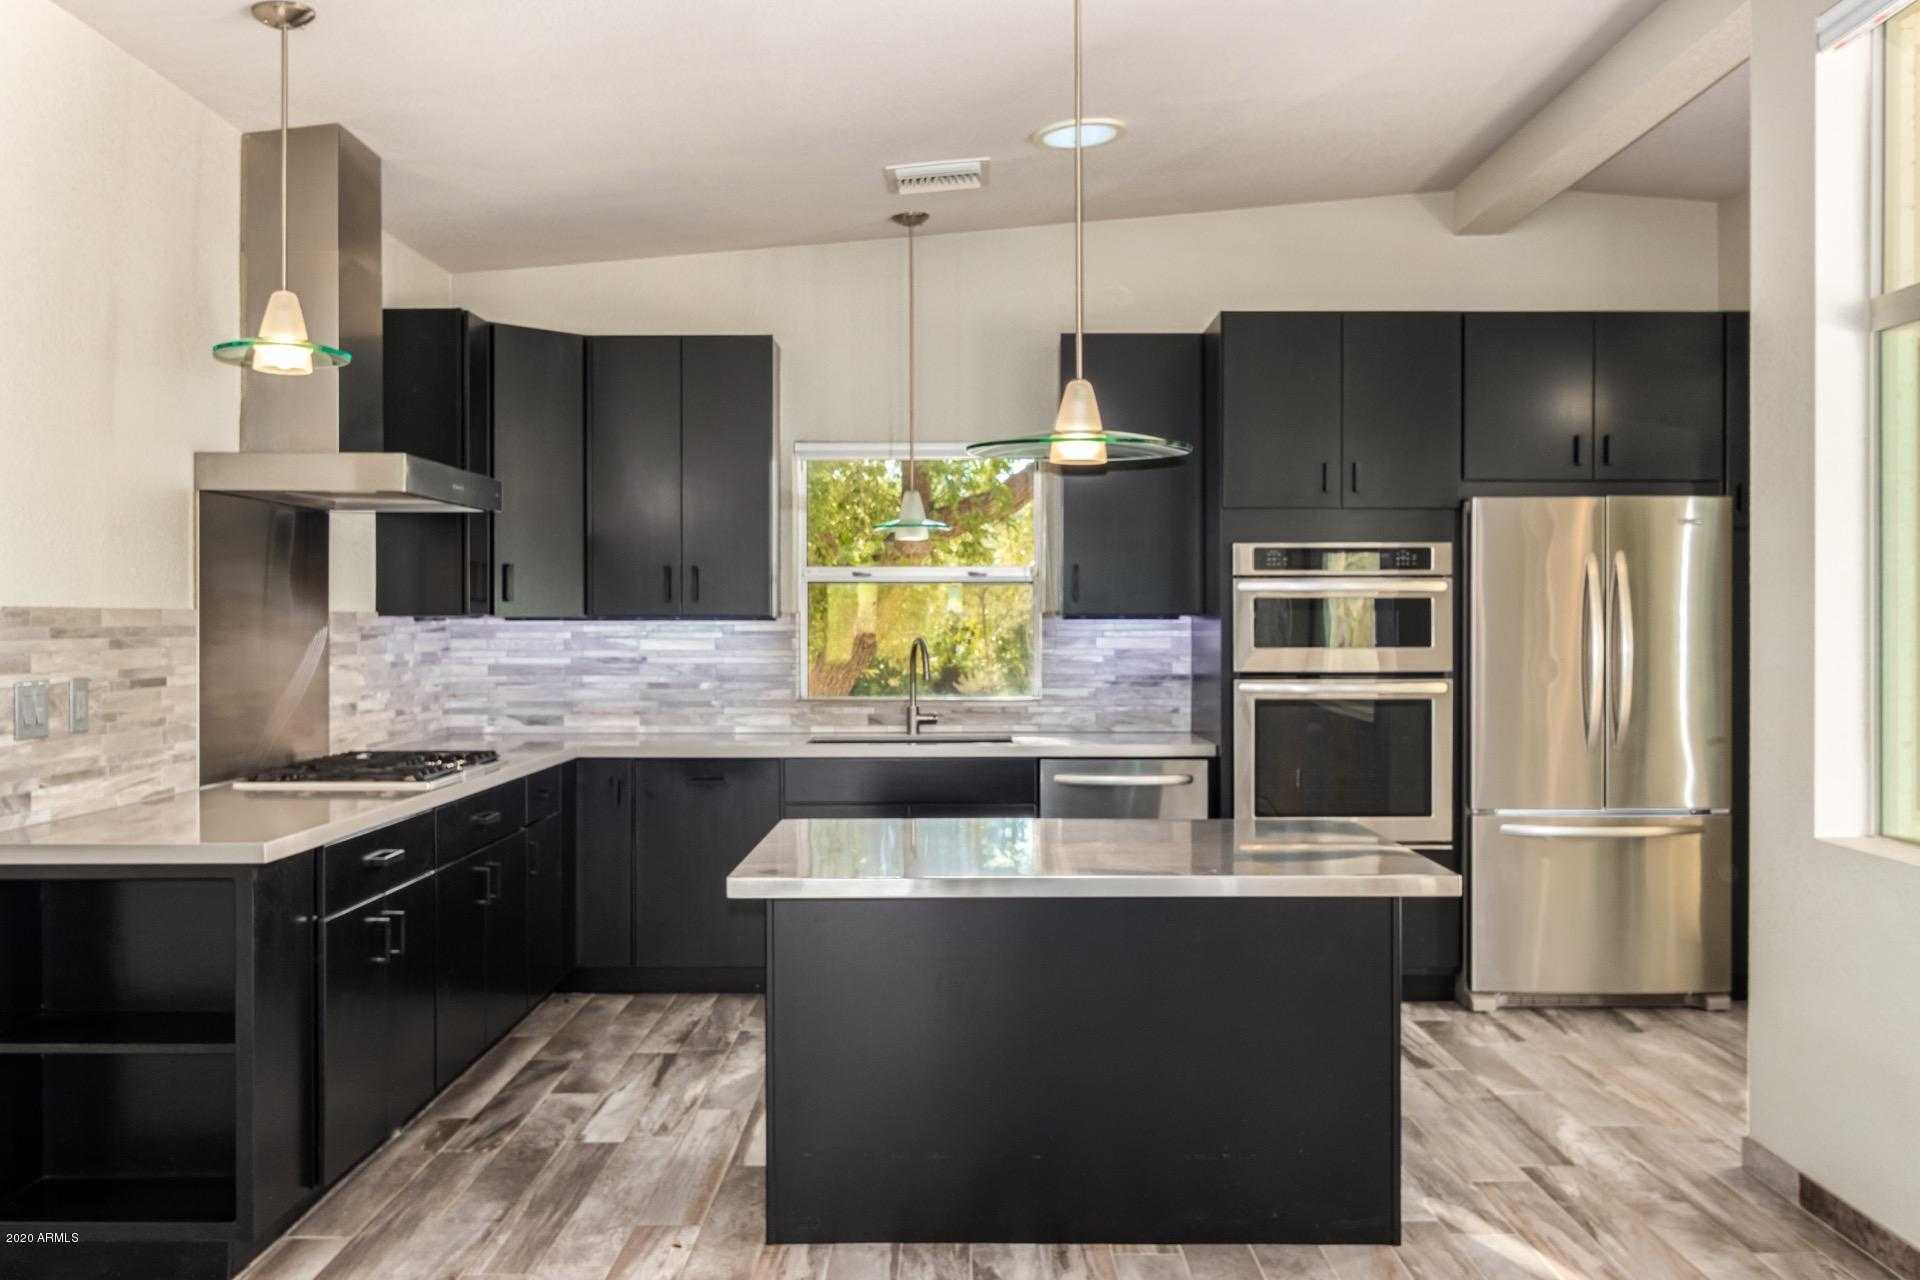 $1,350,000 - 5Br/5Ba - Home for Sale in Desert Villa, Paradise Valley